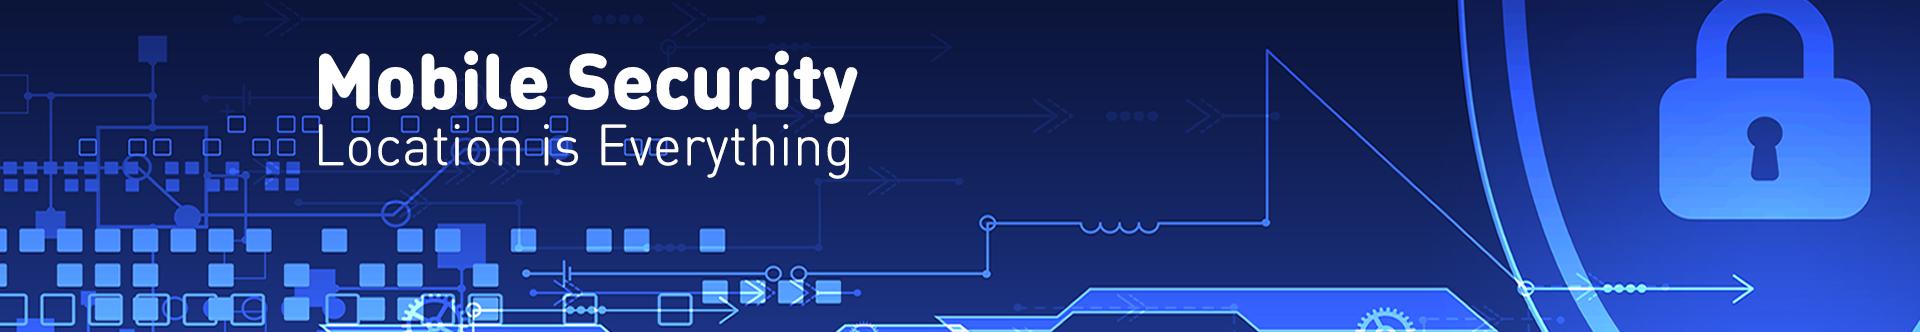 mobile-security-bg